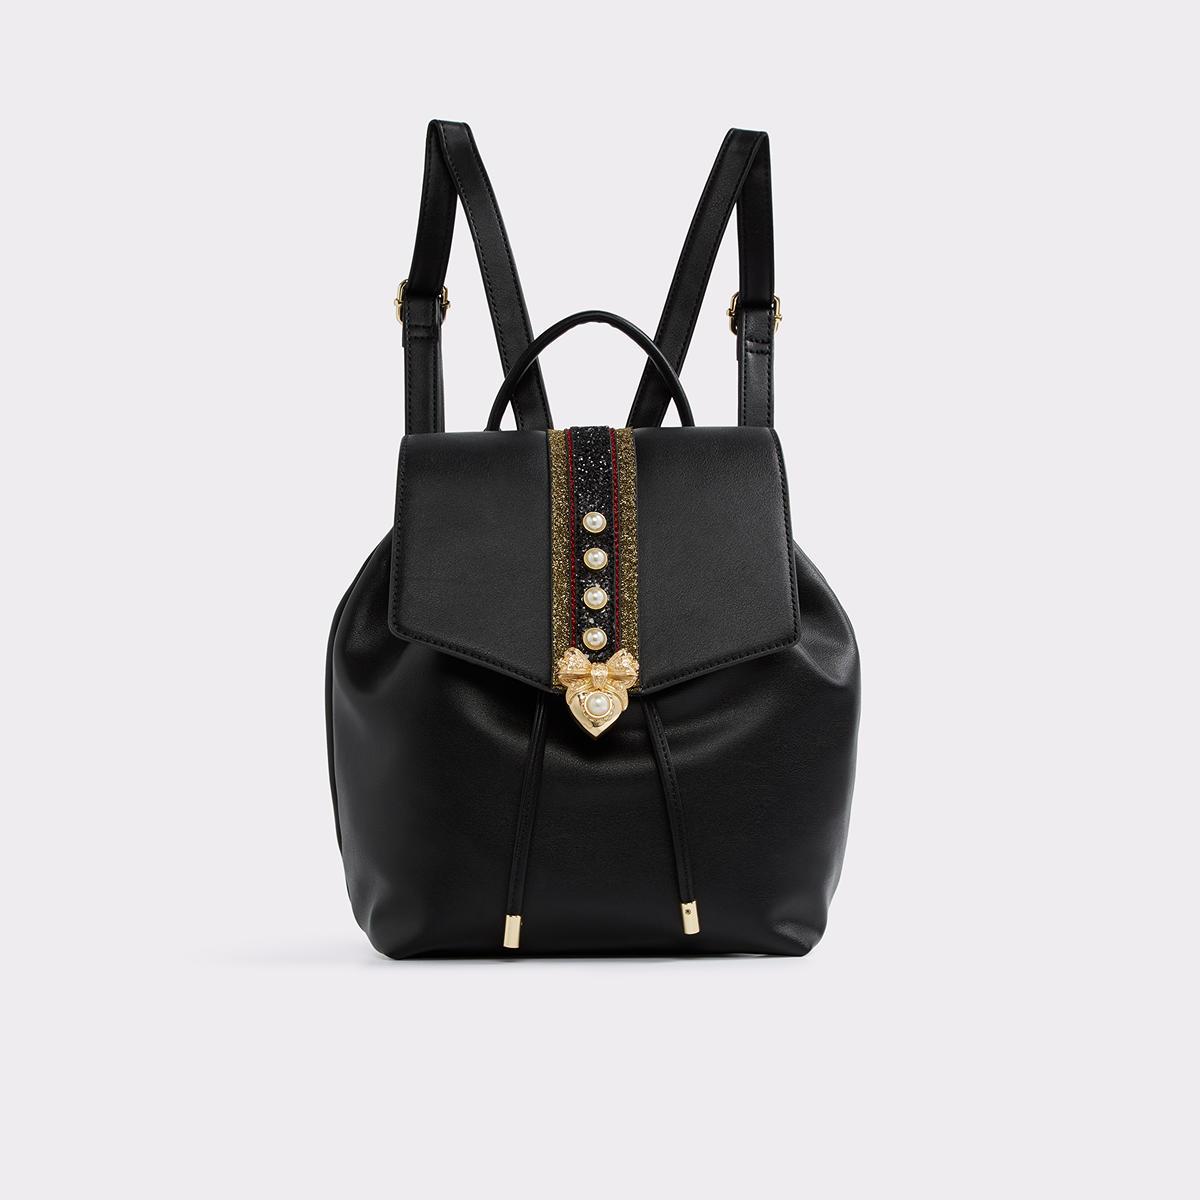 Aradoven Midnight Black Women's Backpacks & duffles | ALDO US at Aldo Shoes in Victor, NY | Tuggl